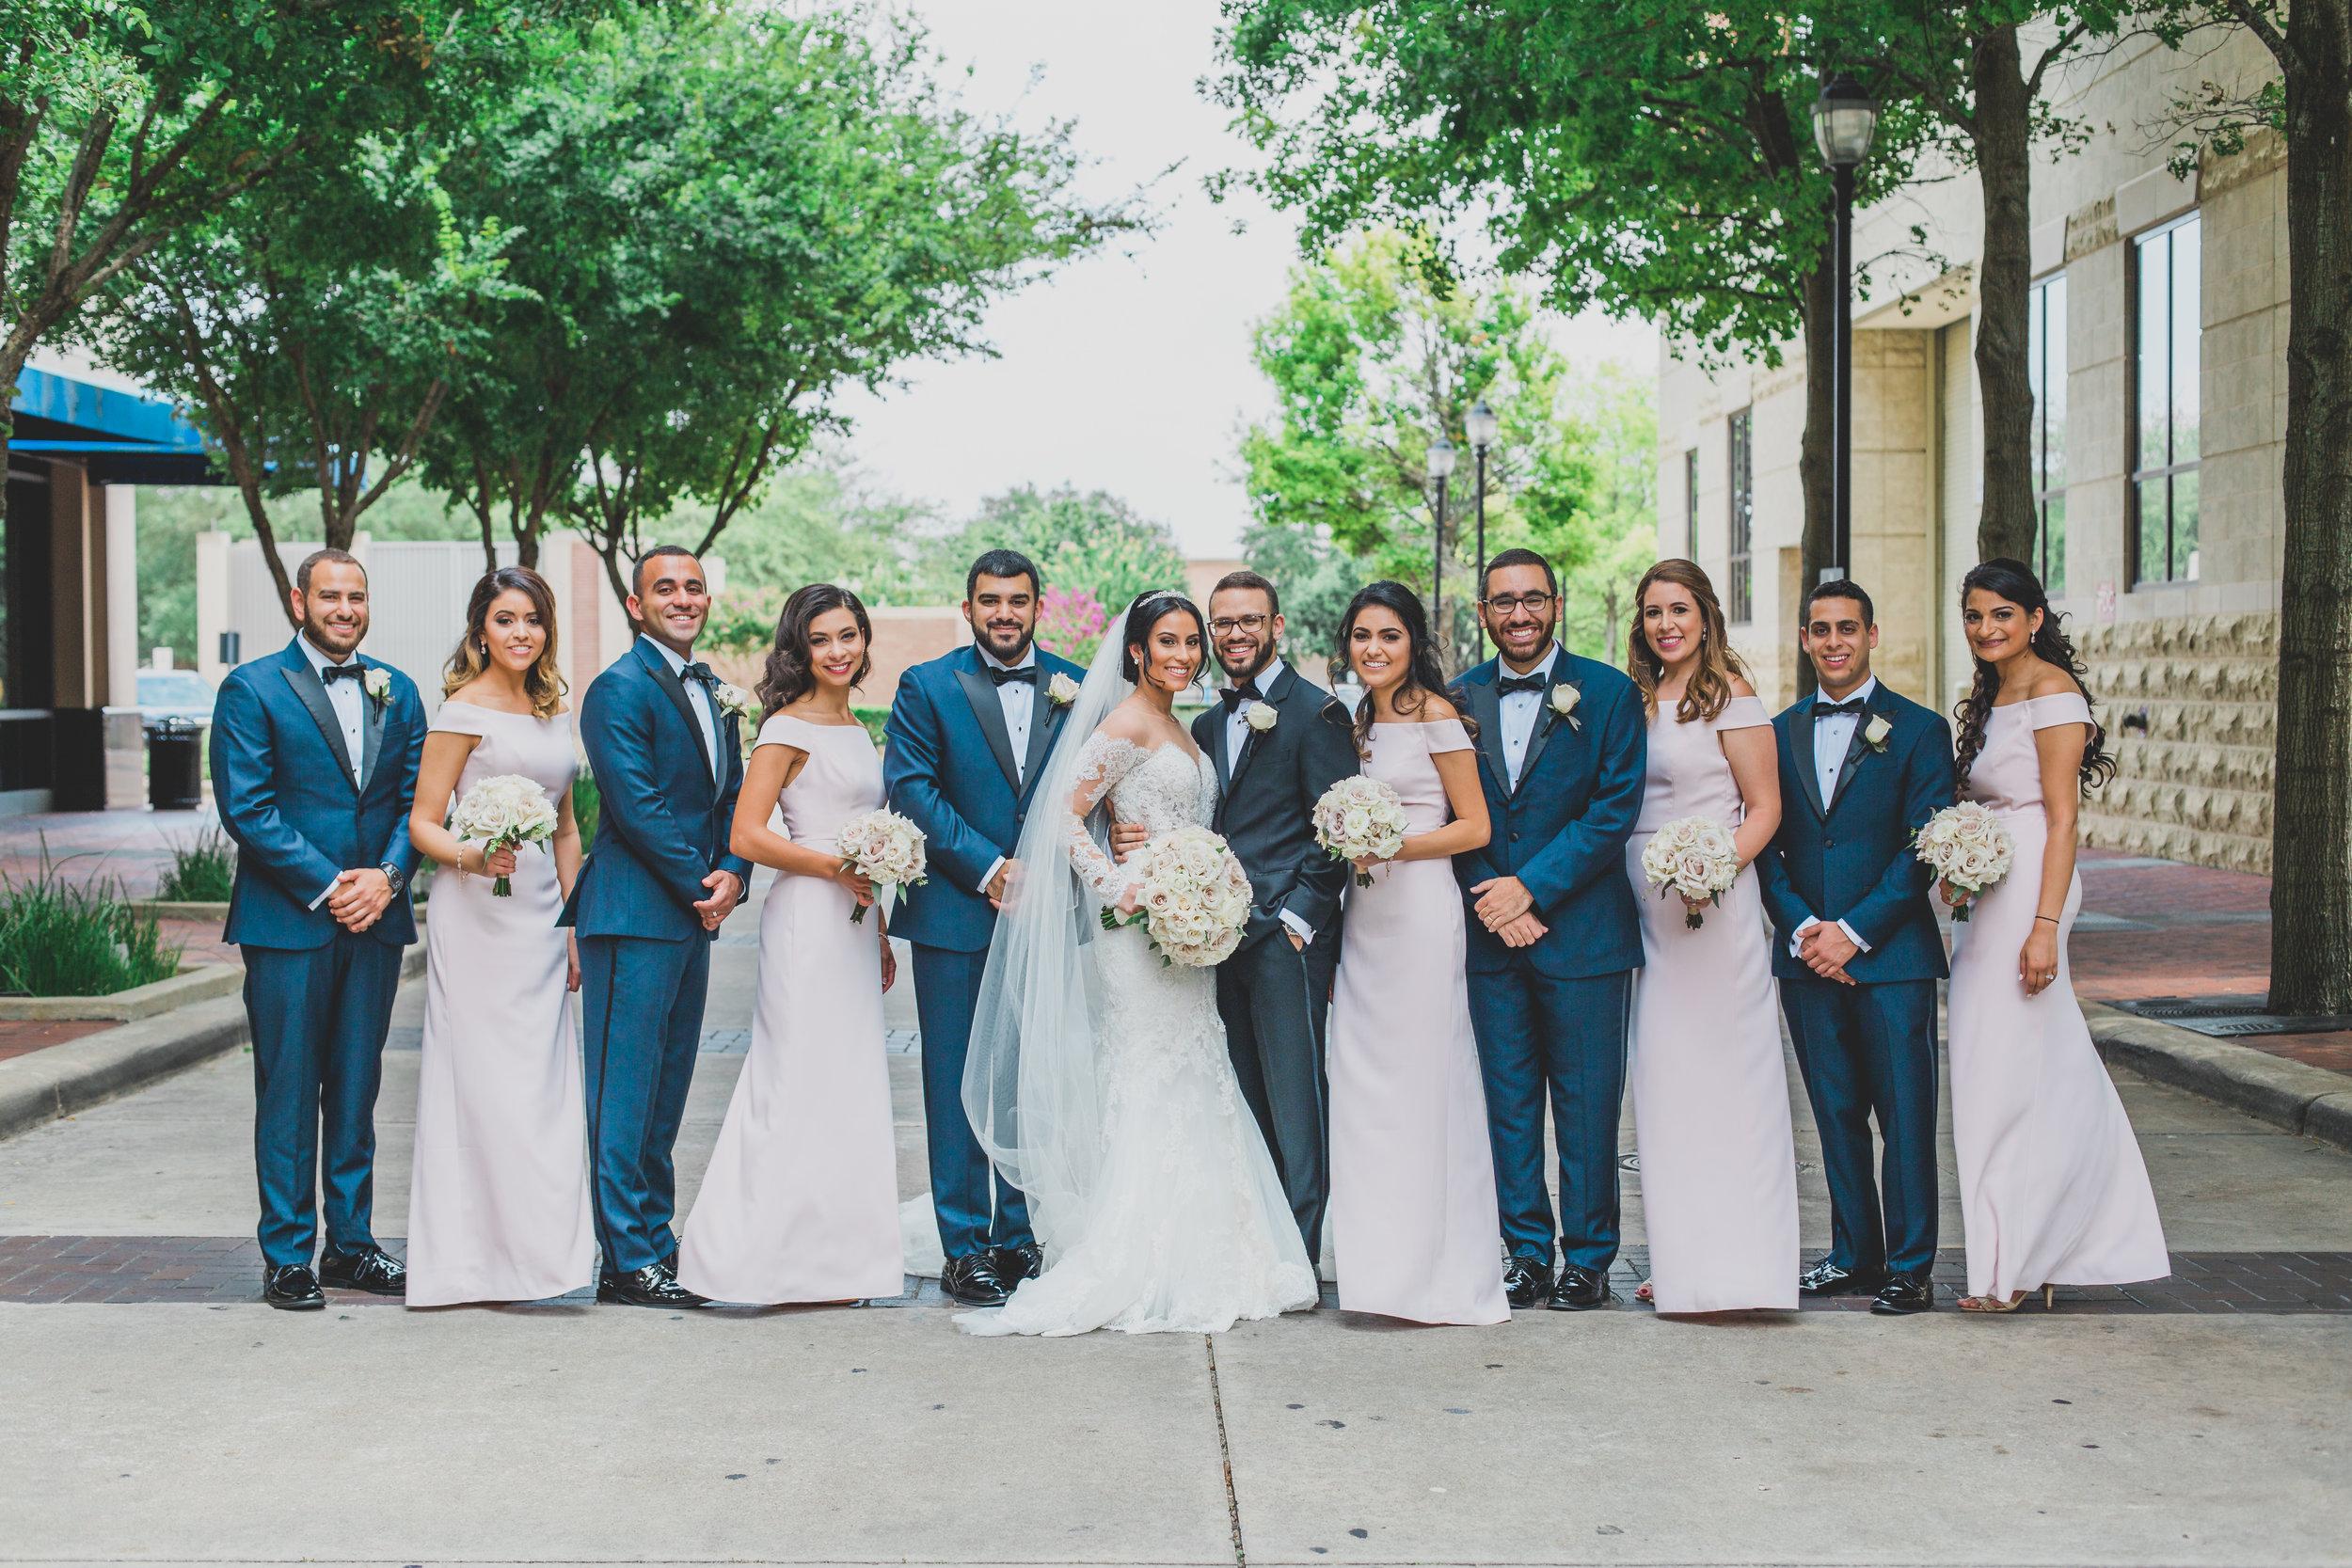 sugar-land-tx-wedding-photography-marriott-bridal-party